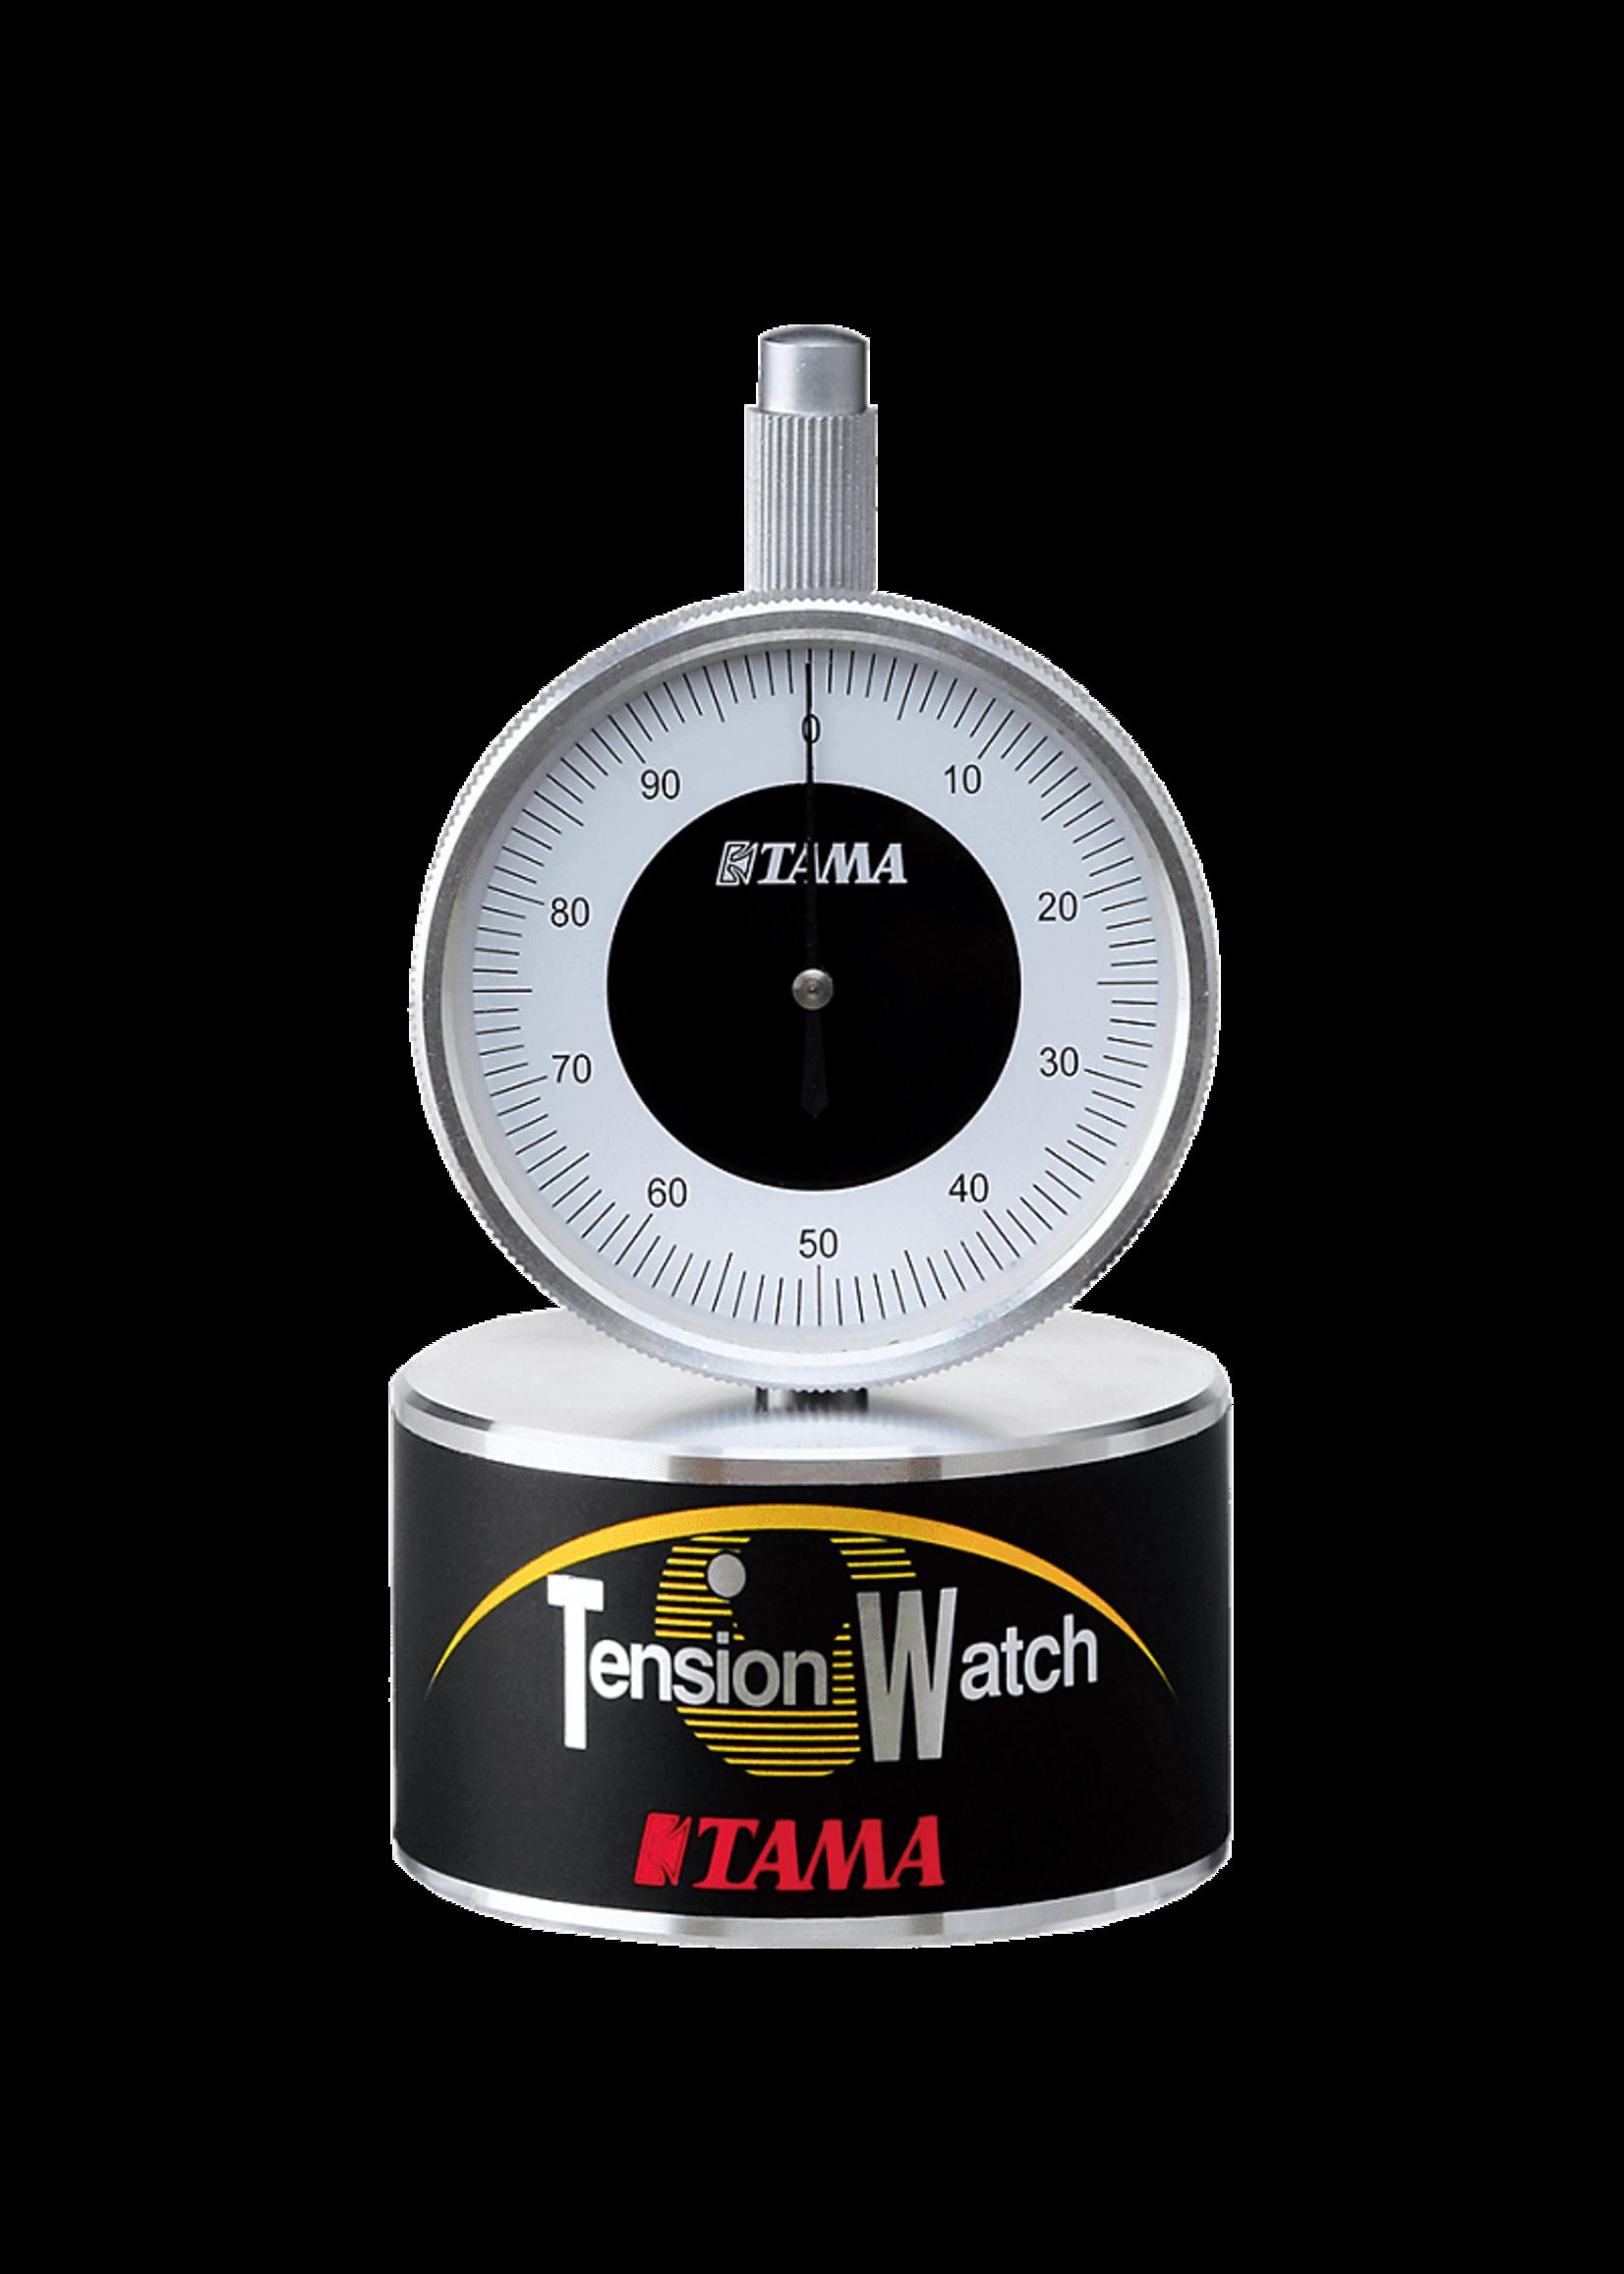 Tama Tama TW100 Tention Watch